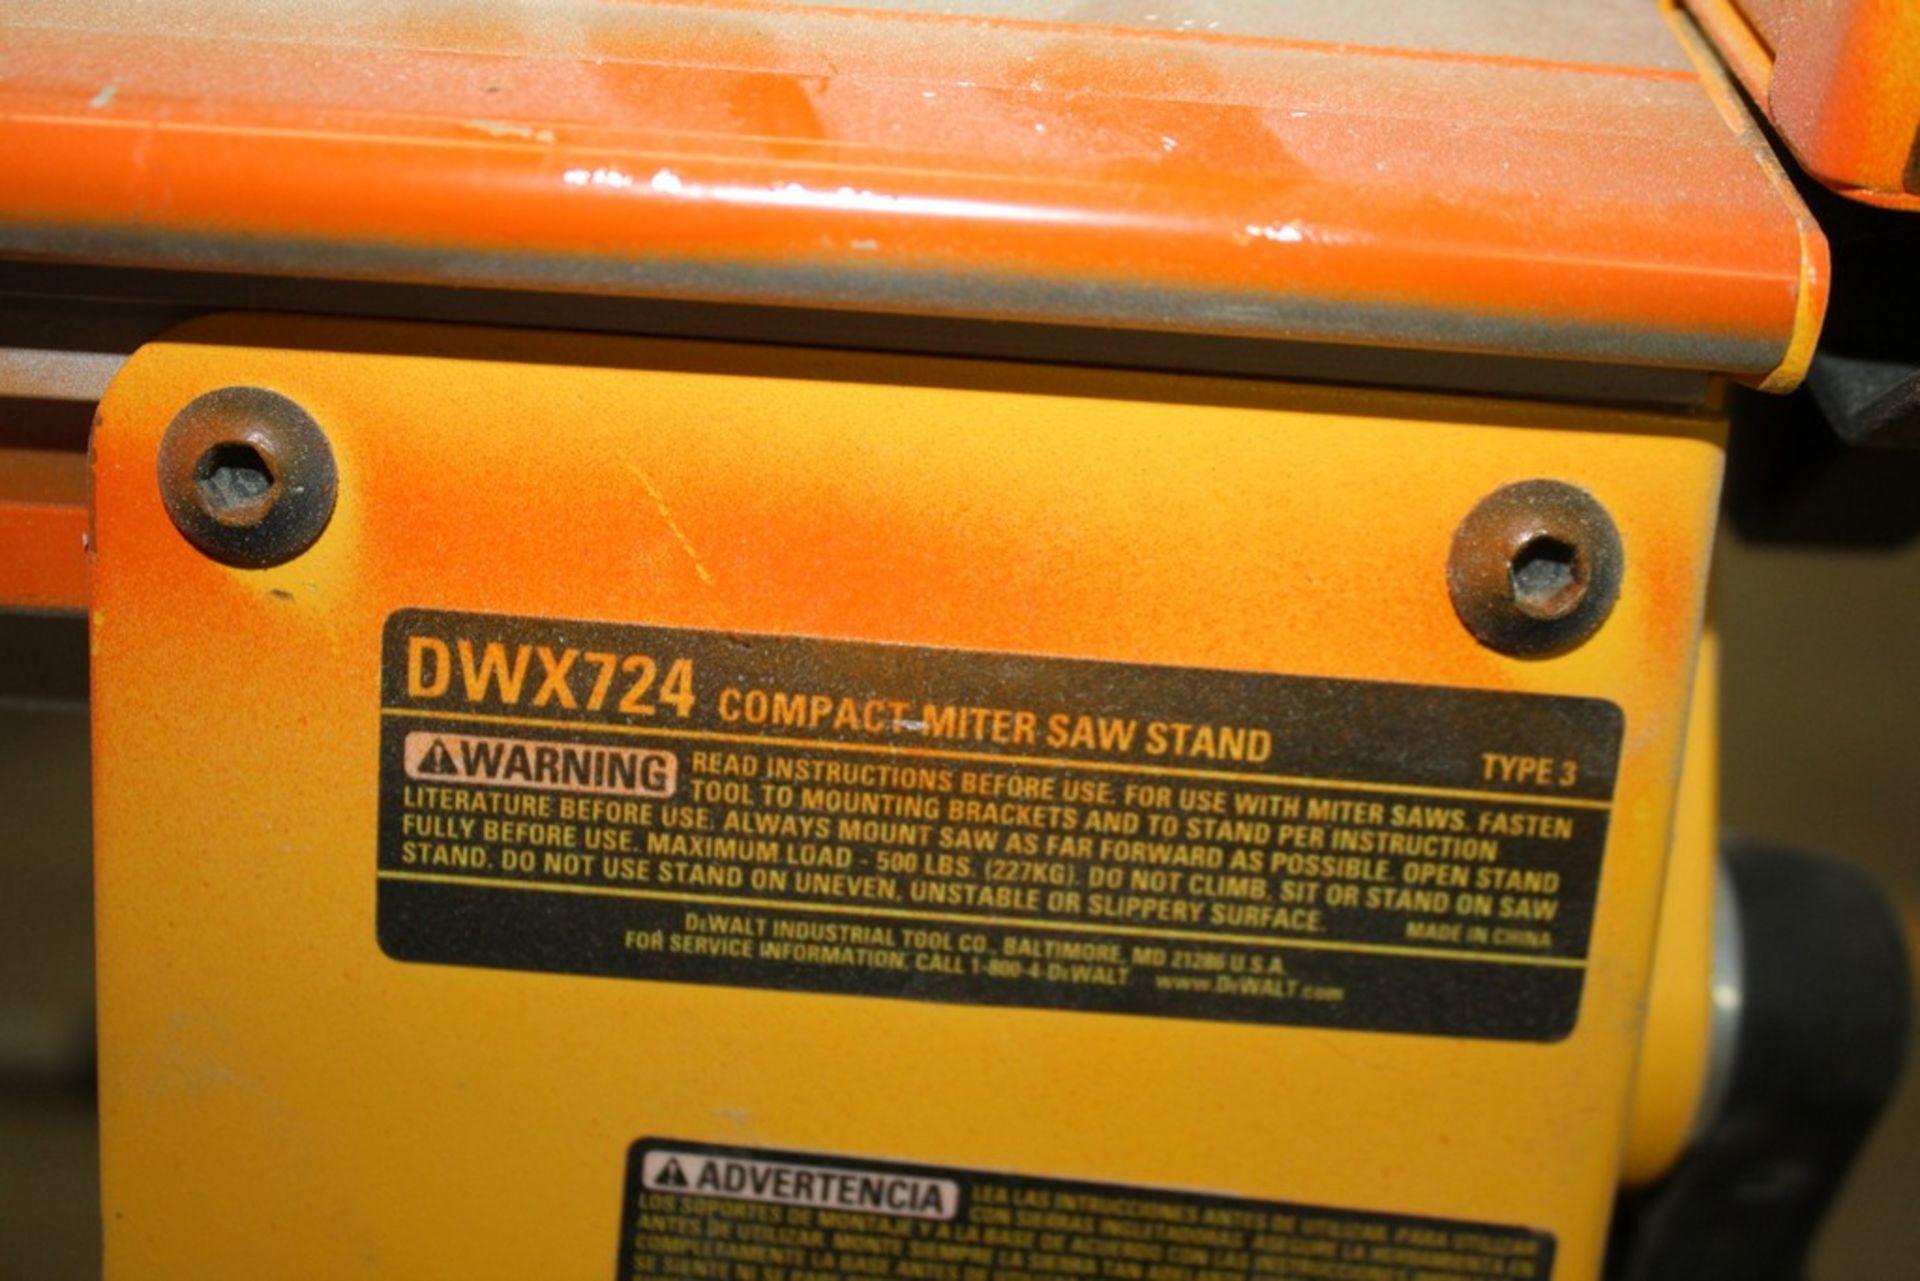 Lot 26 - DEWALT MODEL DWX724 COMPACT MITRE SAW STAND